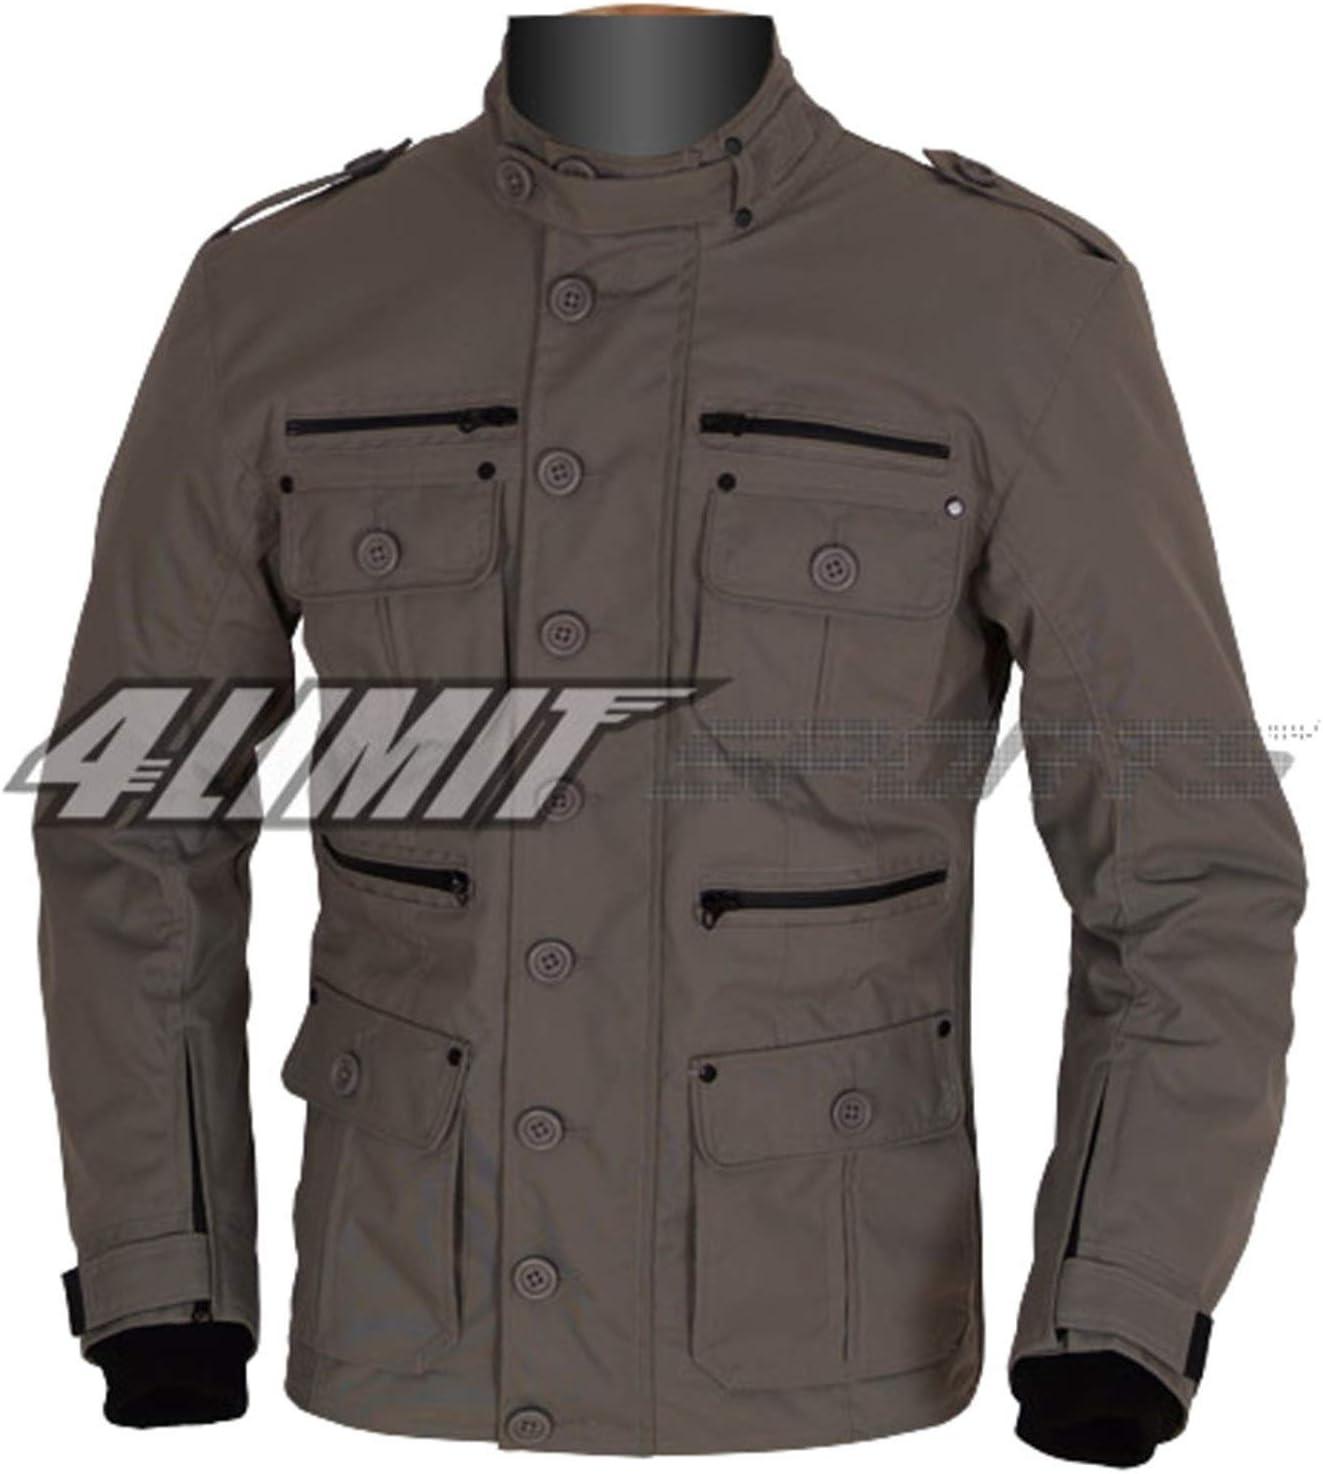 4limit Sports Motorradjacke Gentleman Outdoor Textil Jacke Umbra Grau Auto